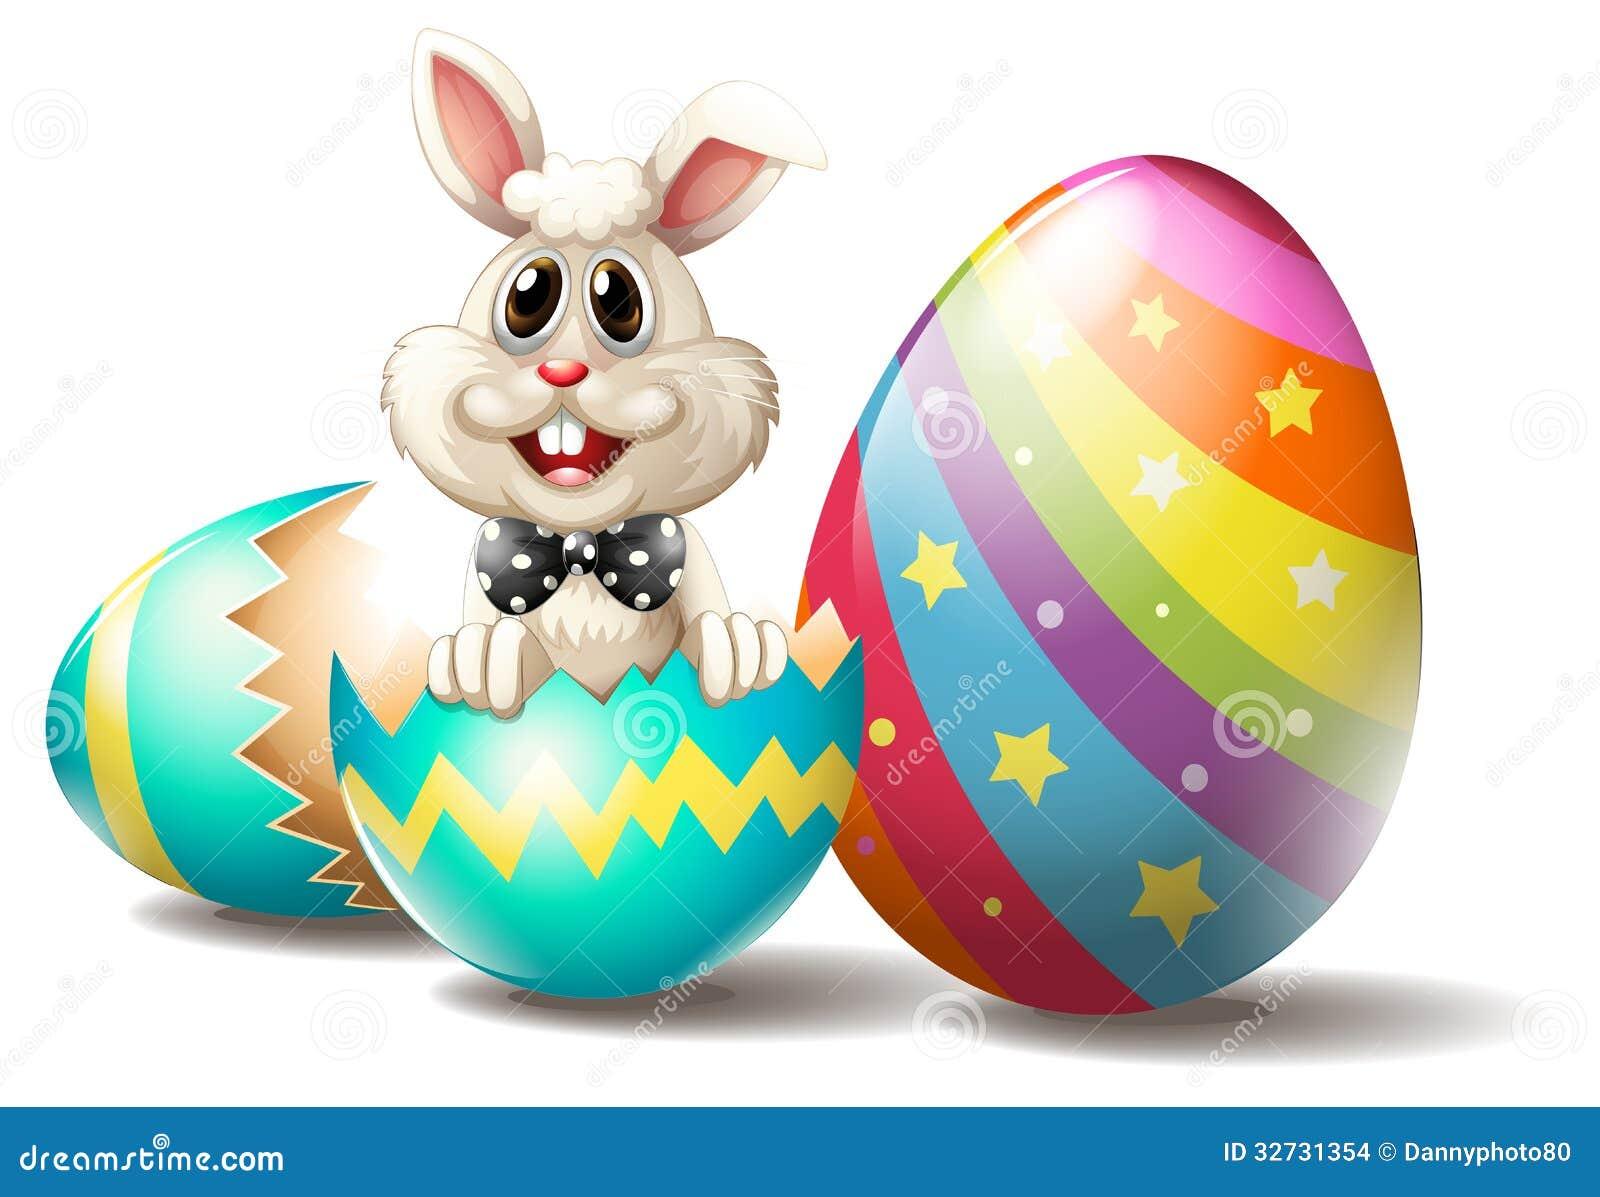 A Rabbit Inside A Cracked Easter Egg Stock Vector